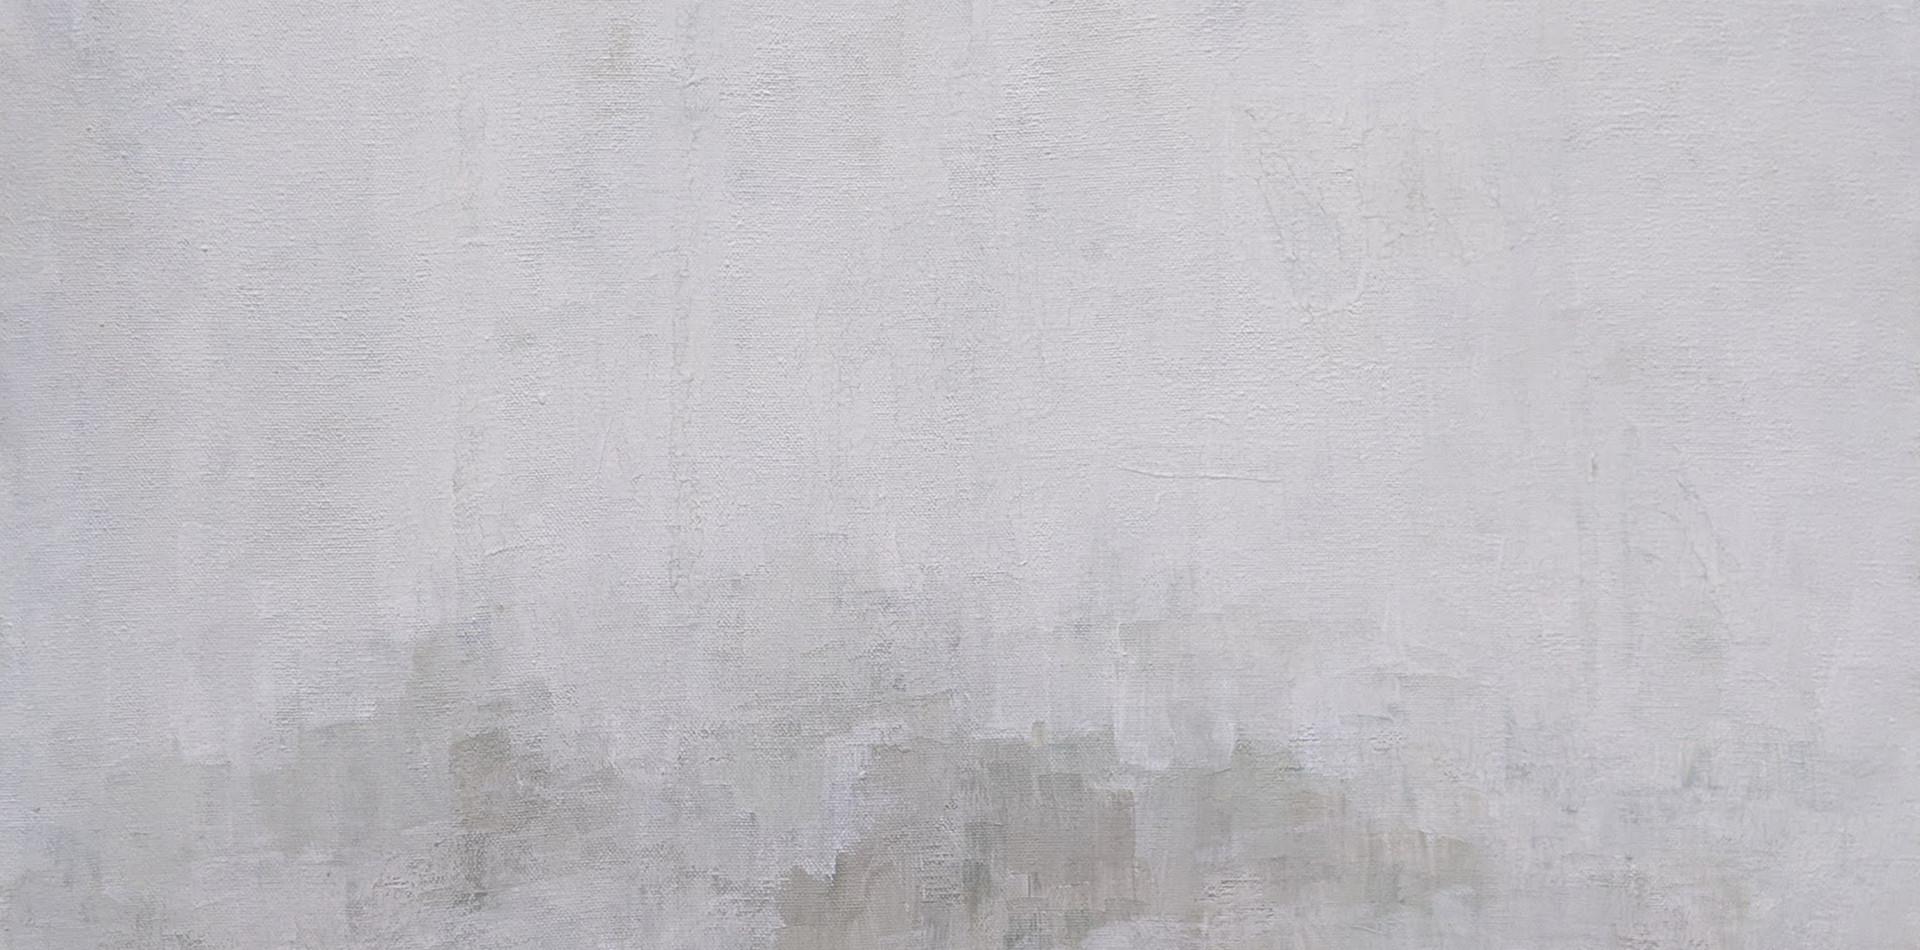 Neblina   2018  Acrílica sobre tela  40 x 50 cm